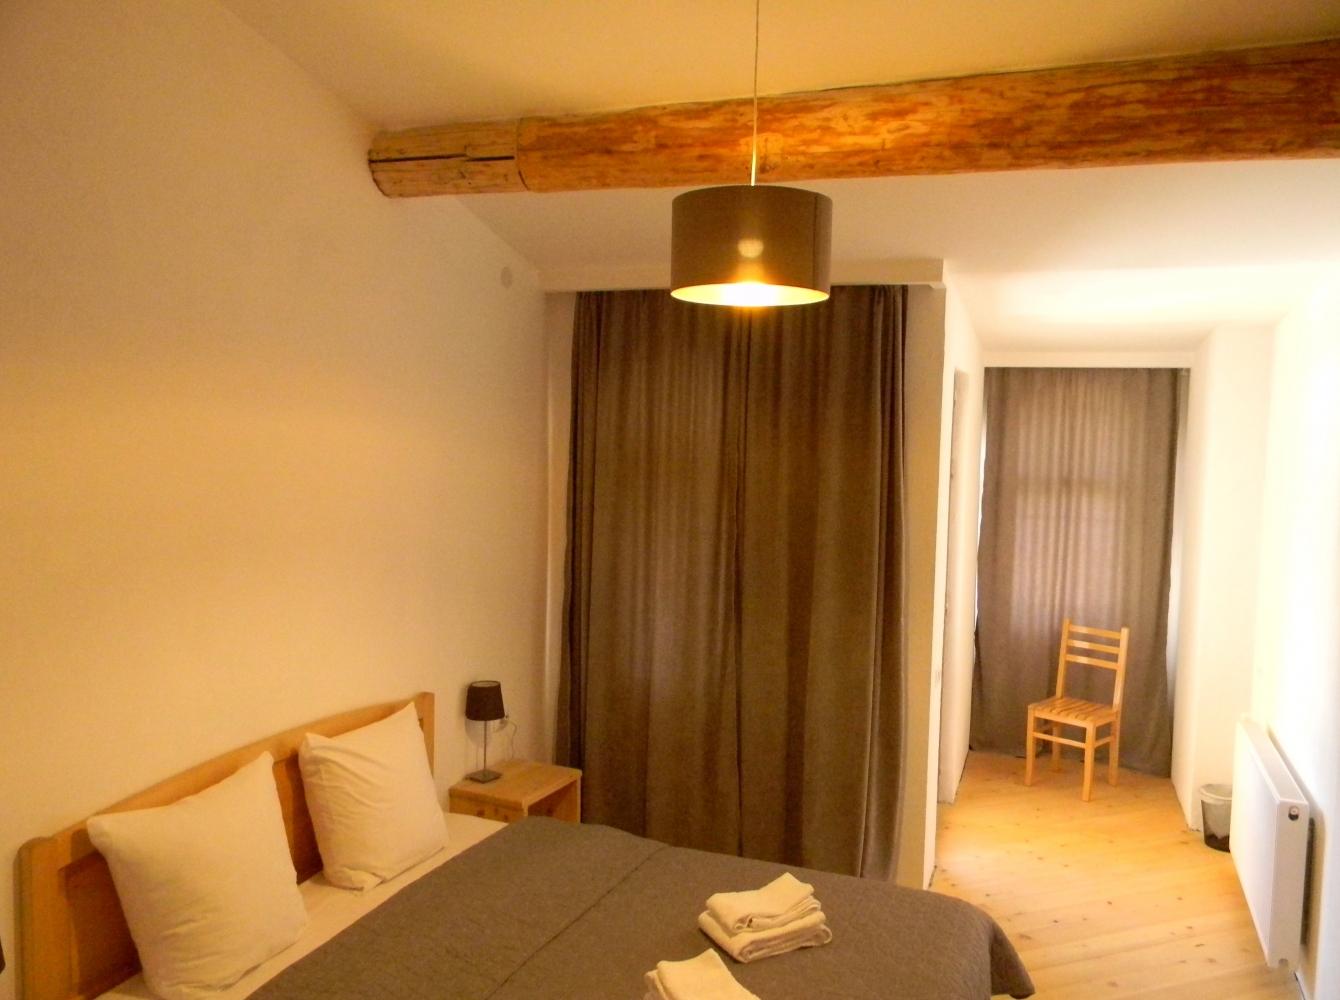 doppelbettzimmer mit balkon. Black Bedroom Furniture Sets. Home Design Ideas